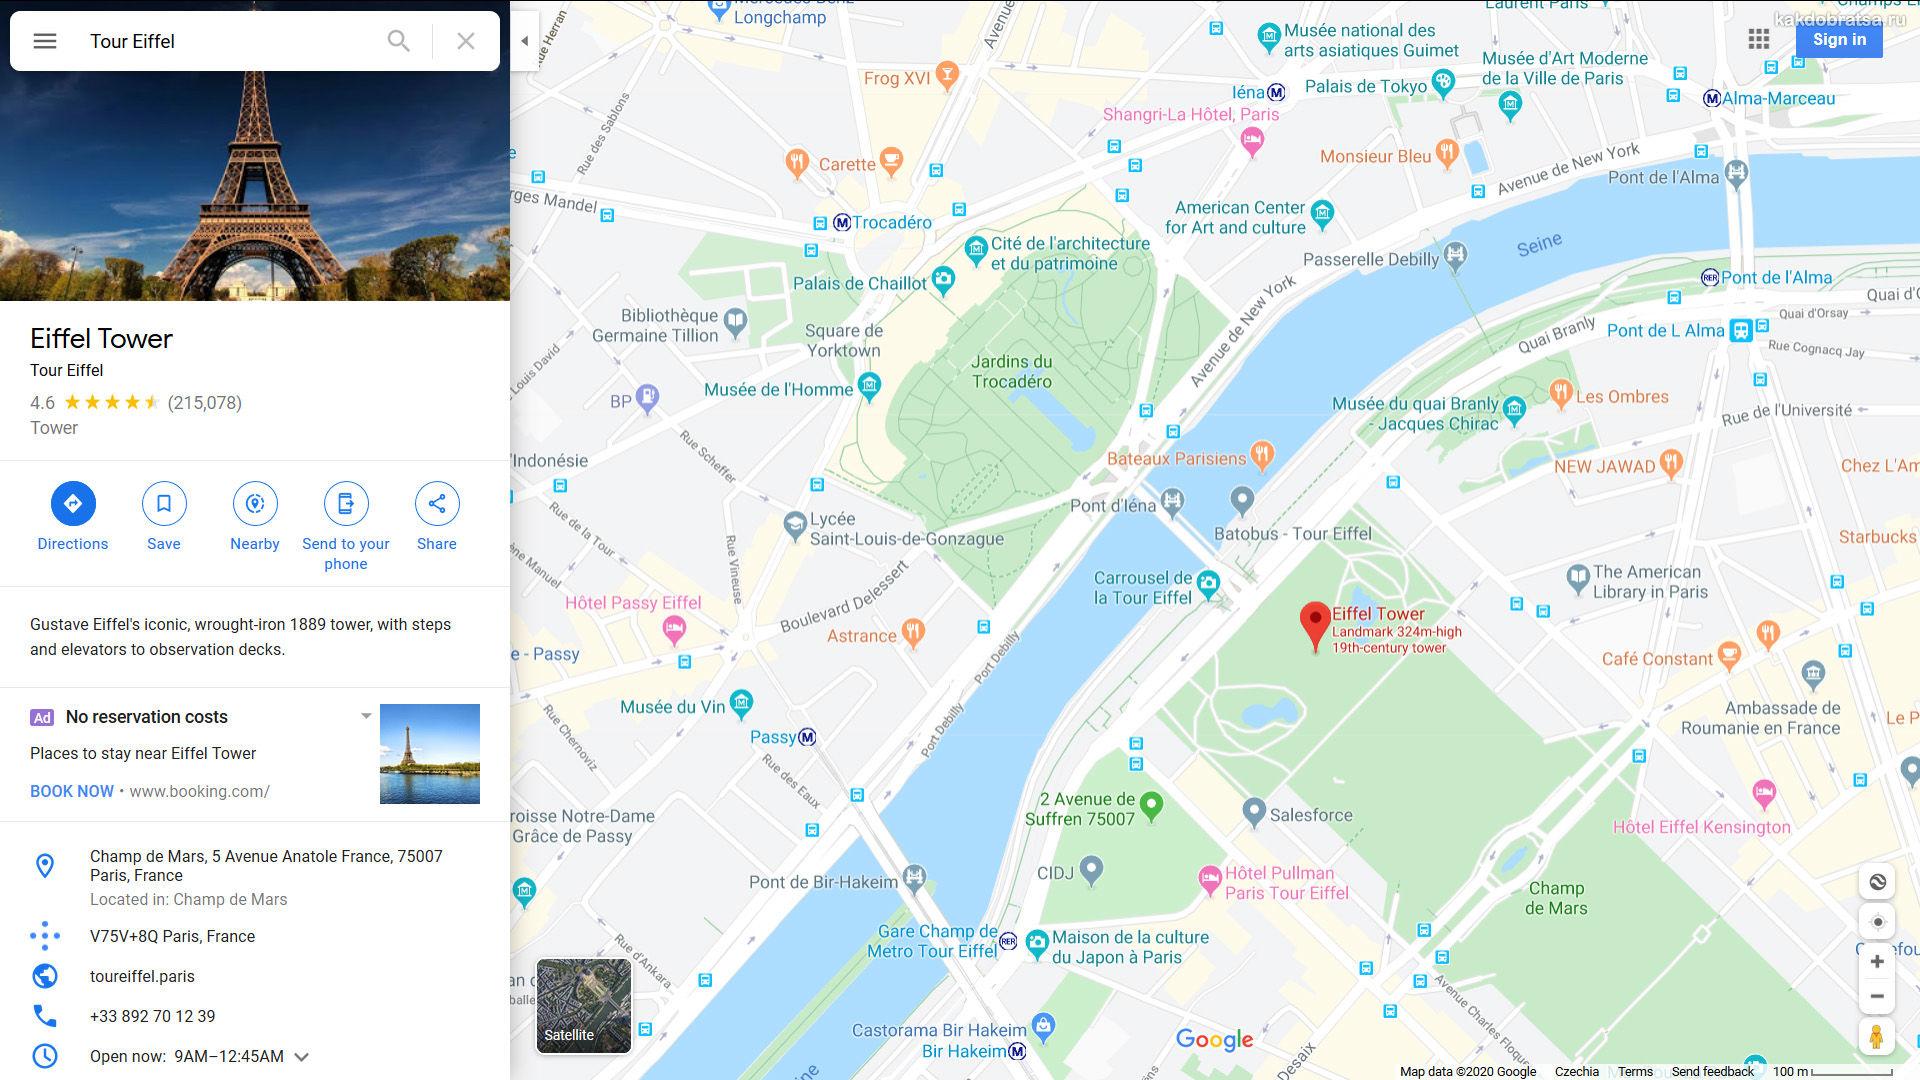 Эйфелева башня адрес и локация на карте